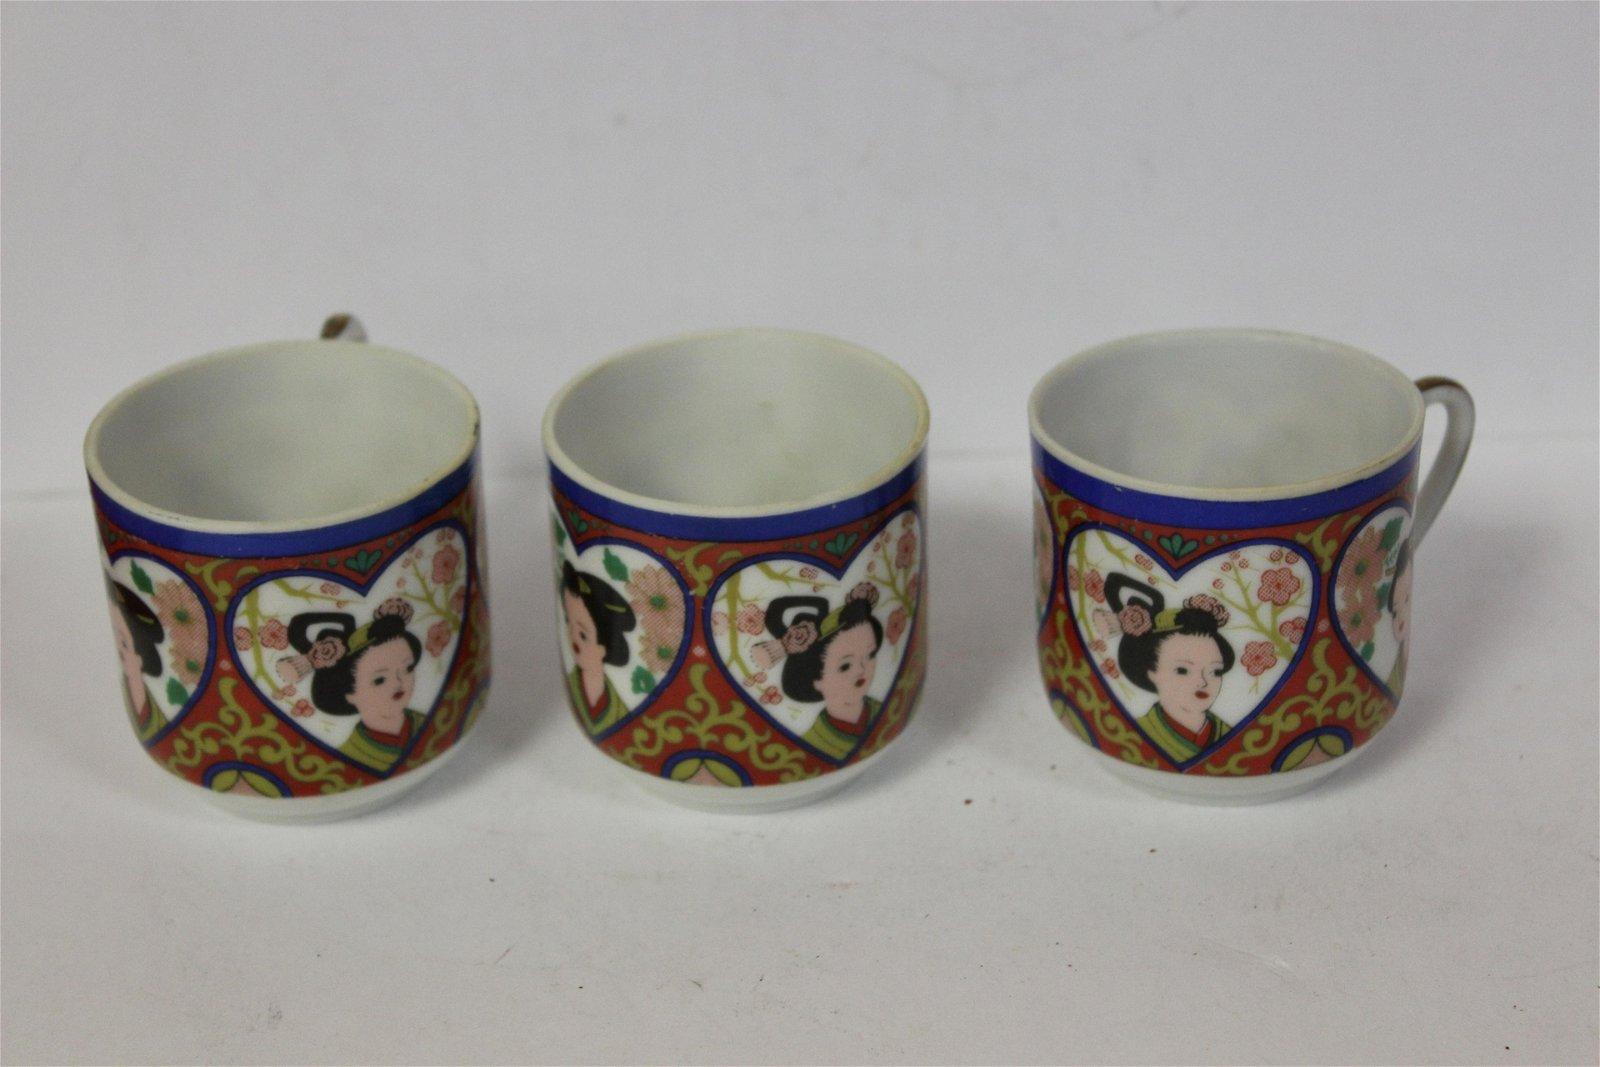 Lot of Three Japanese Lithophane Cups